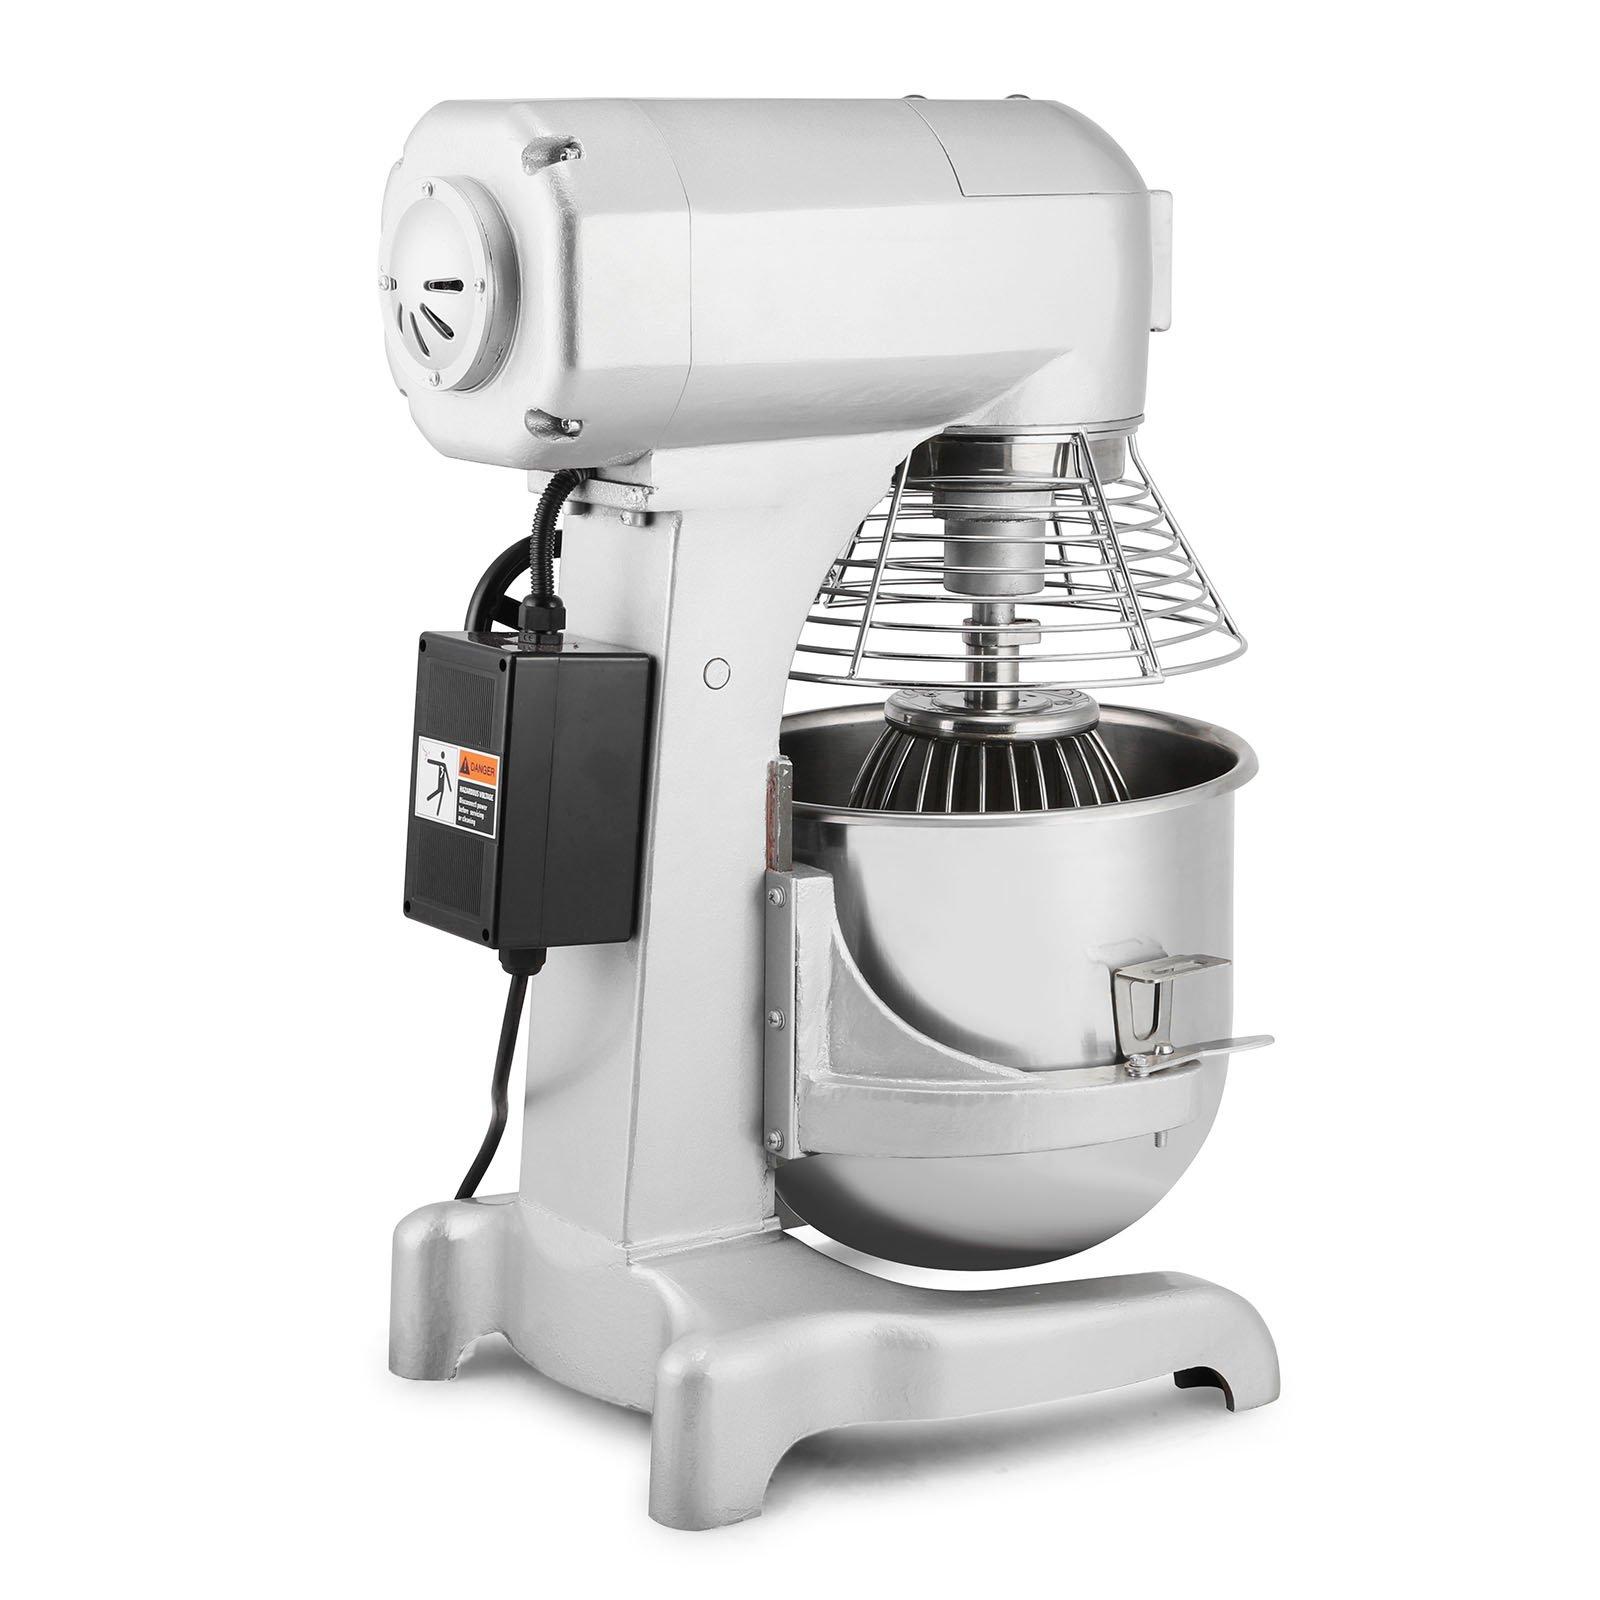 Happybuy Commercial Food Mixer 750W Dough Mixer Maker 3 Speeds Adjustable Commercial Mixer Grinder 94/165/386 RPM Stand Mixer (20 qt) by Happybuy (Image #2)